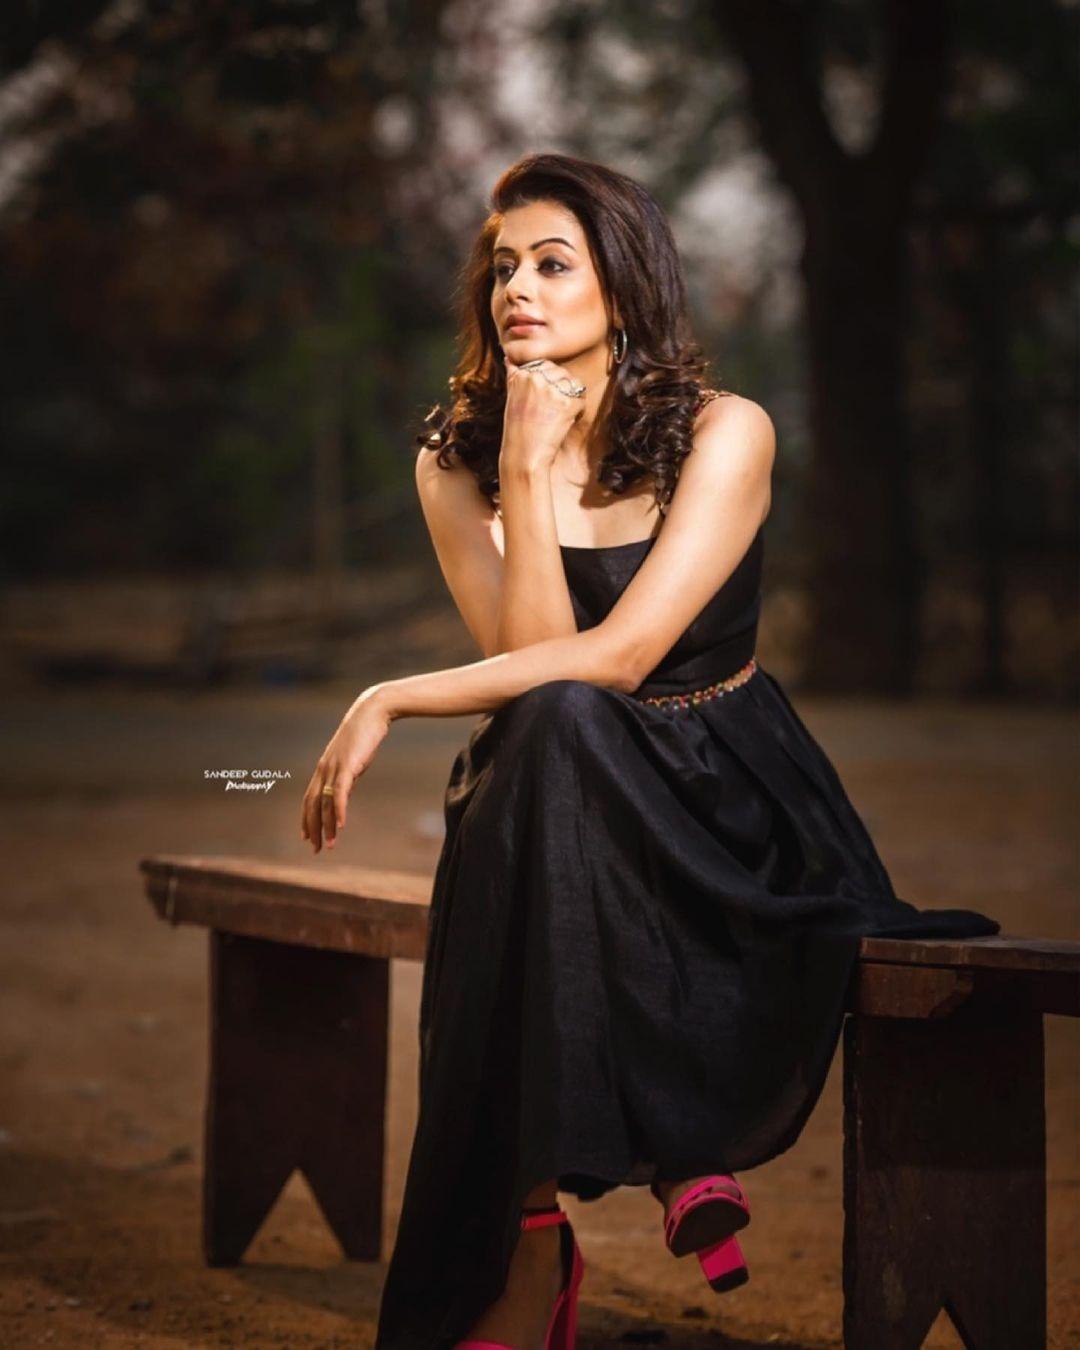 Priyamani raj in a custom made black dress my mehak shetty for dhee kings-3